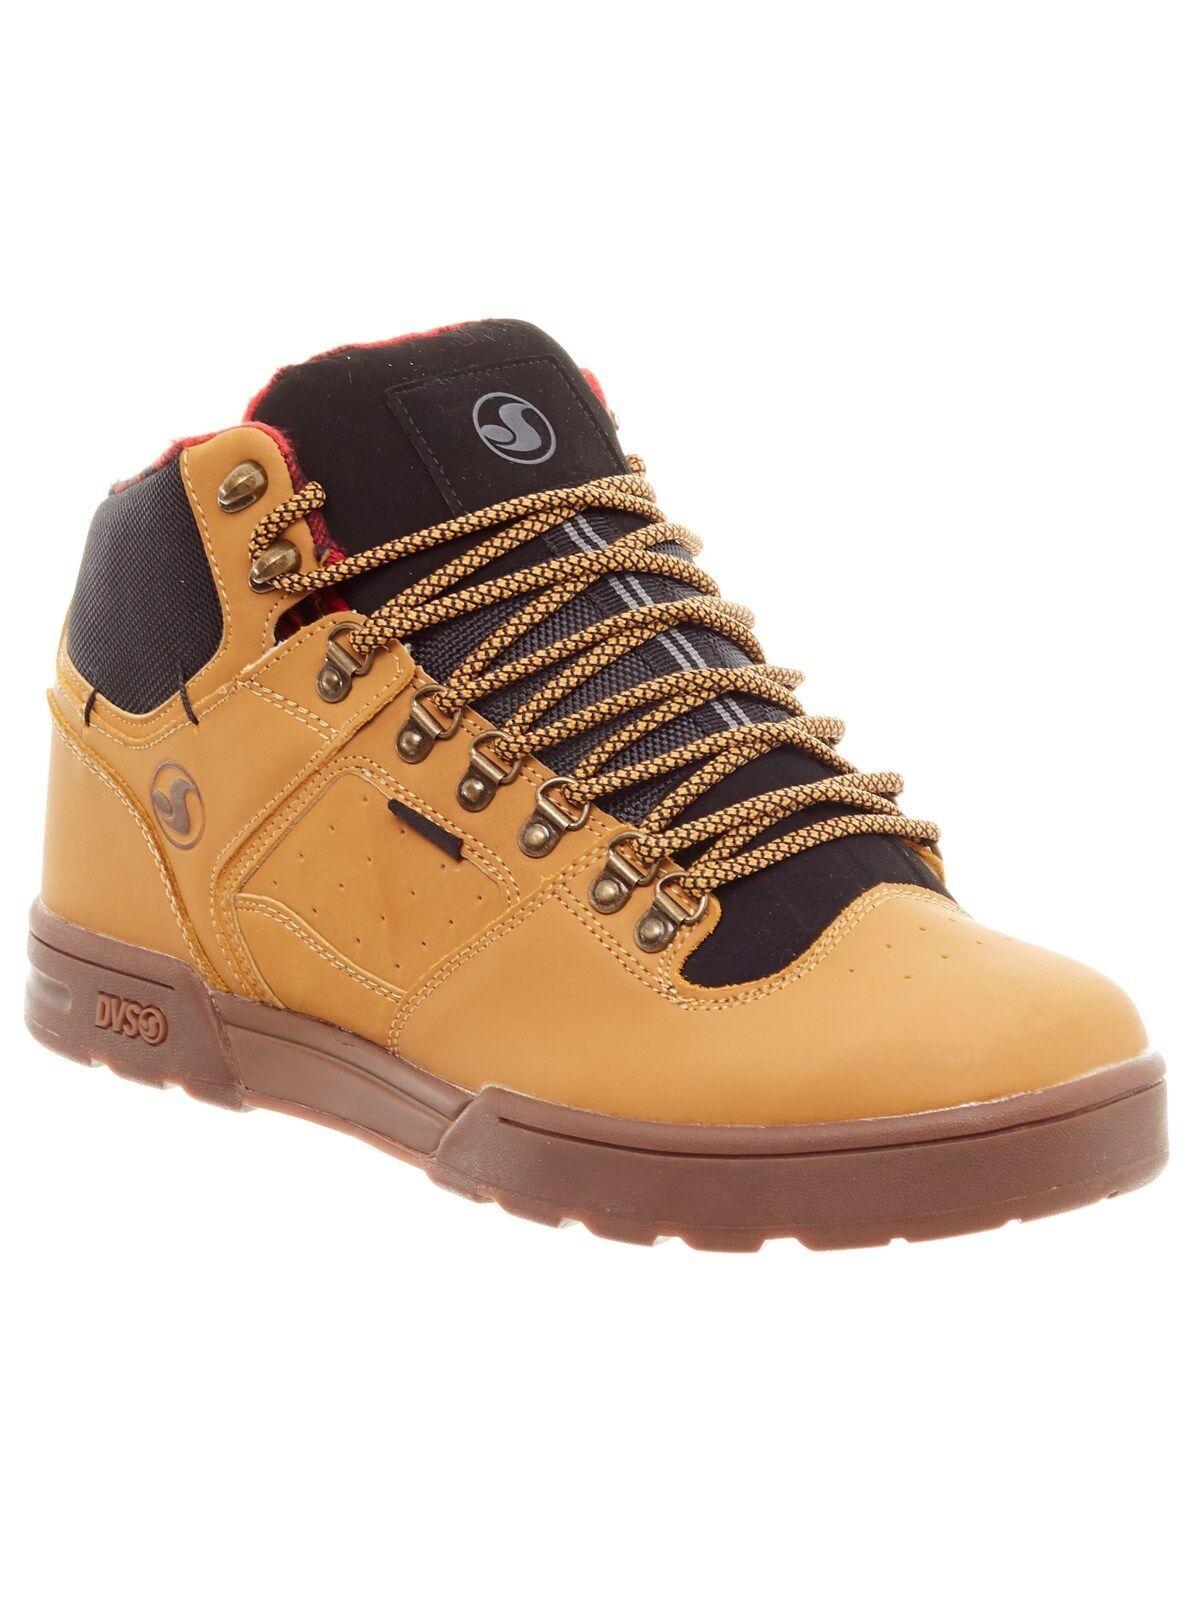 DVS Westridge Chamois Nubuck Leather botas zapatos